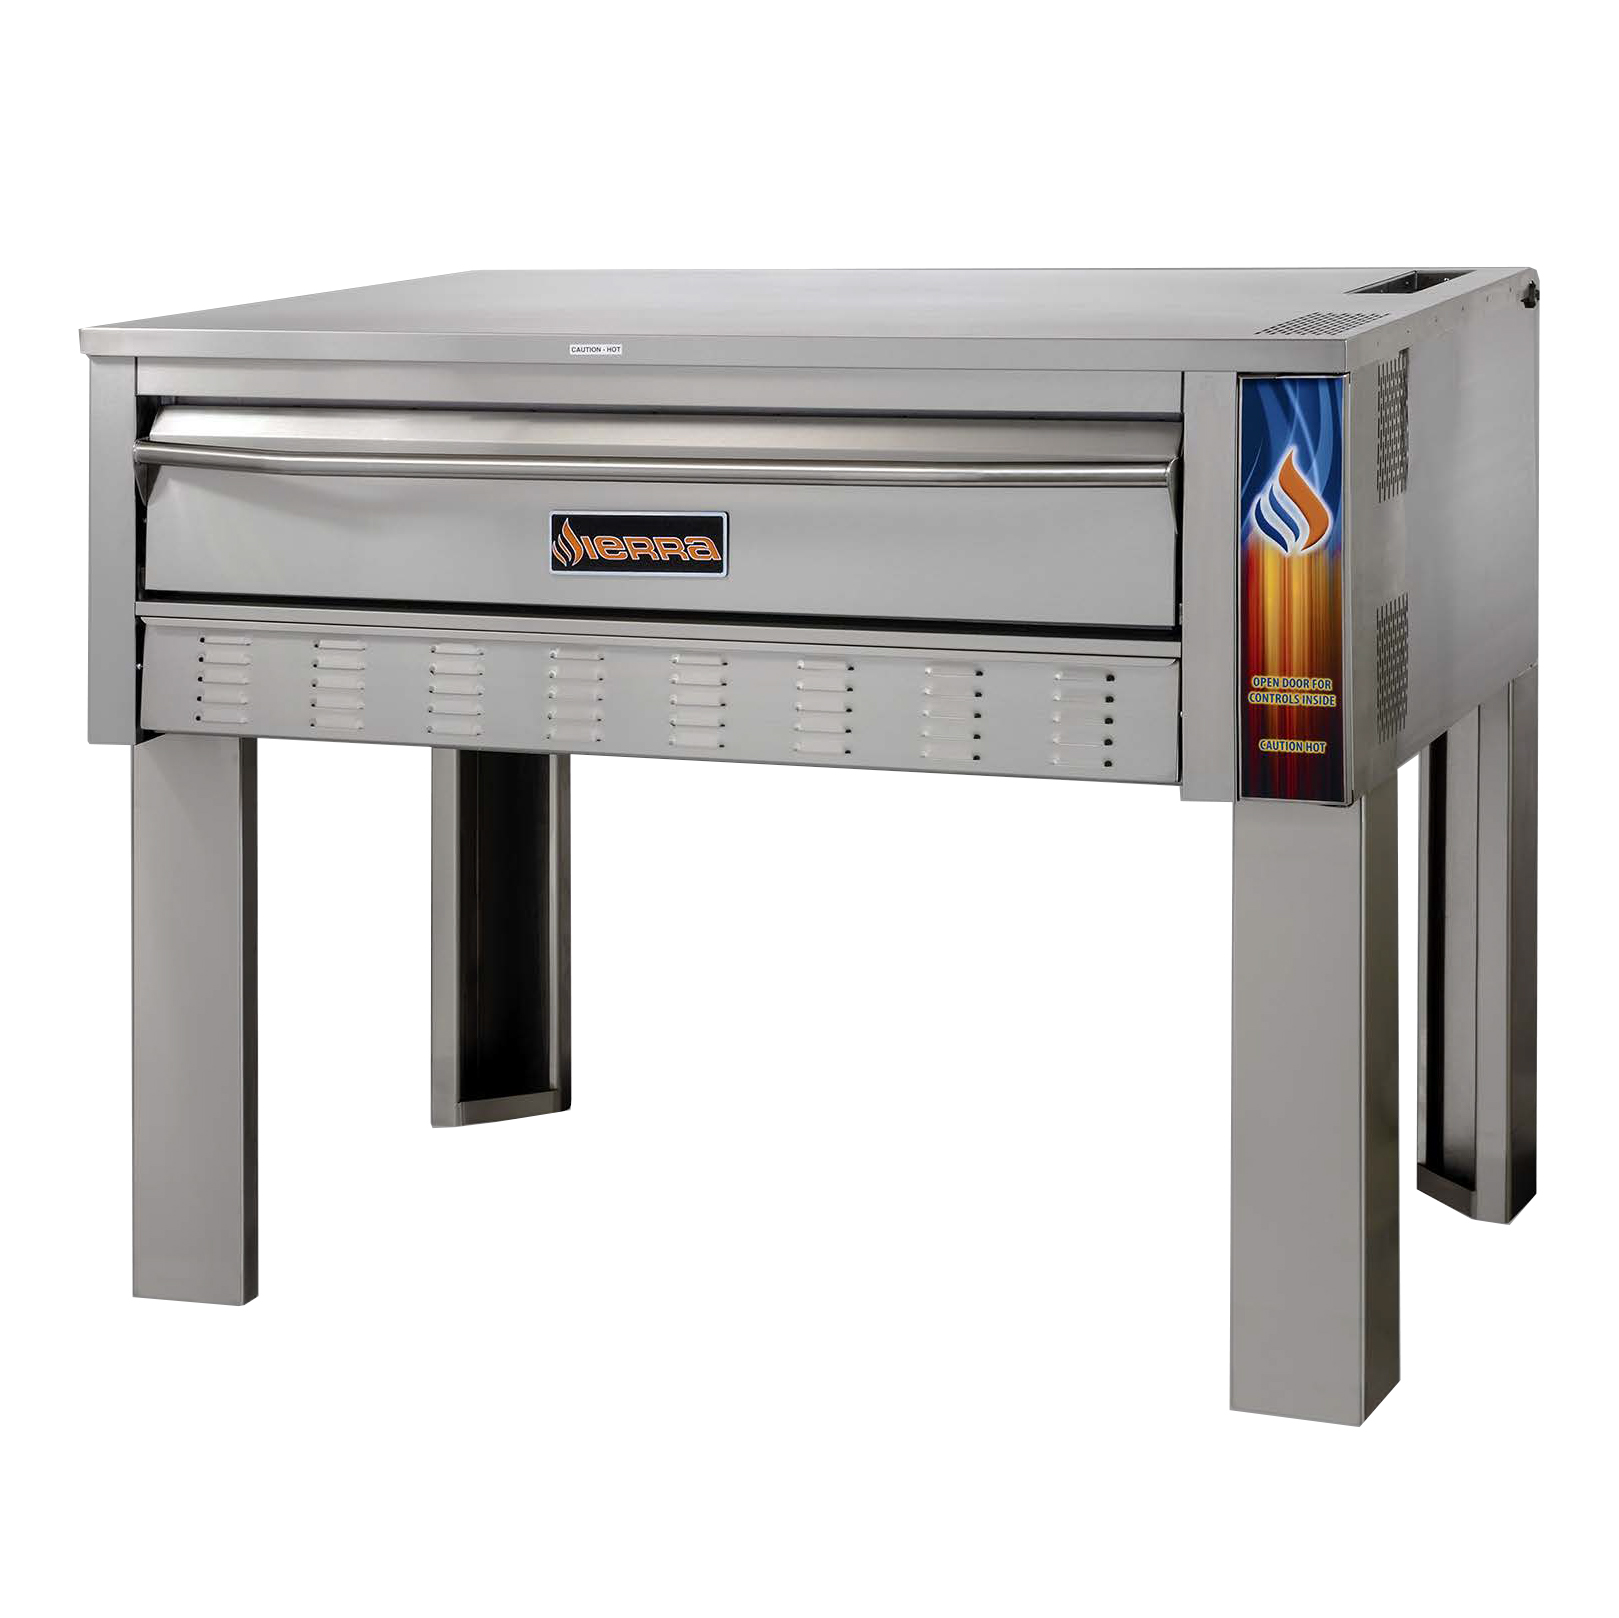 MVP SRPO-48G pizza bake oven, deck-type, gas